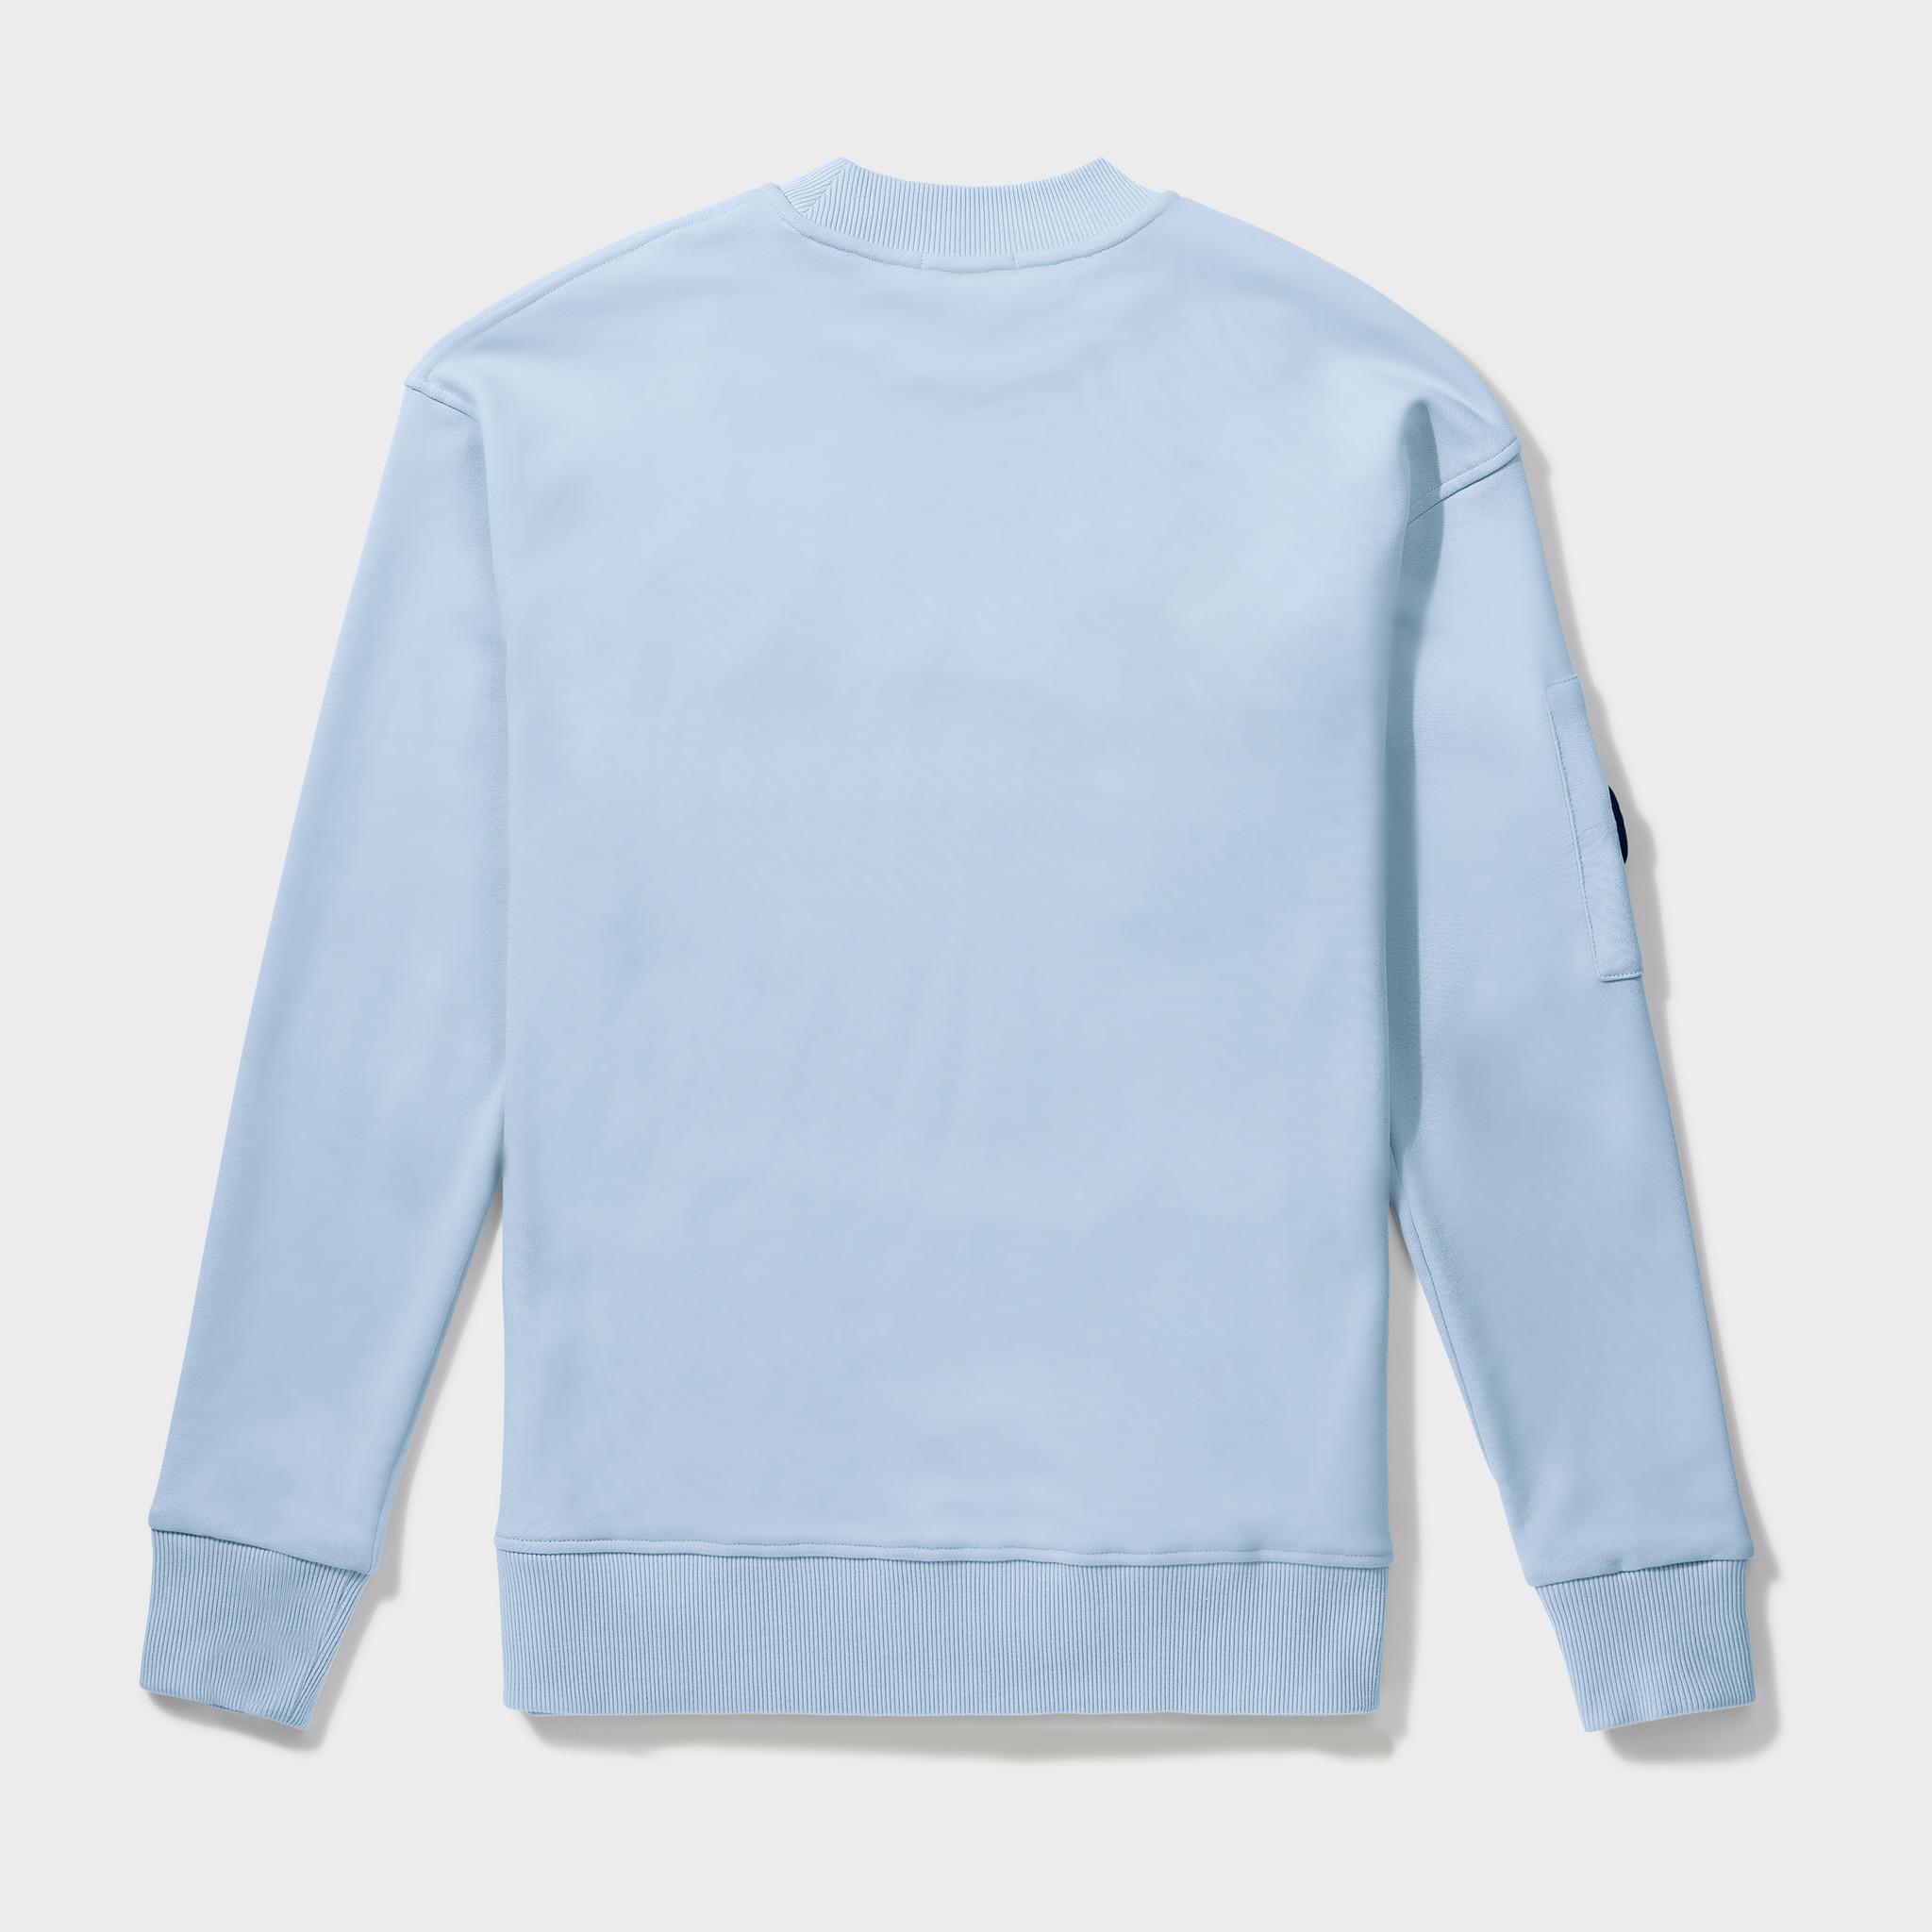 Wafi Signature Sweater Light Blue-2